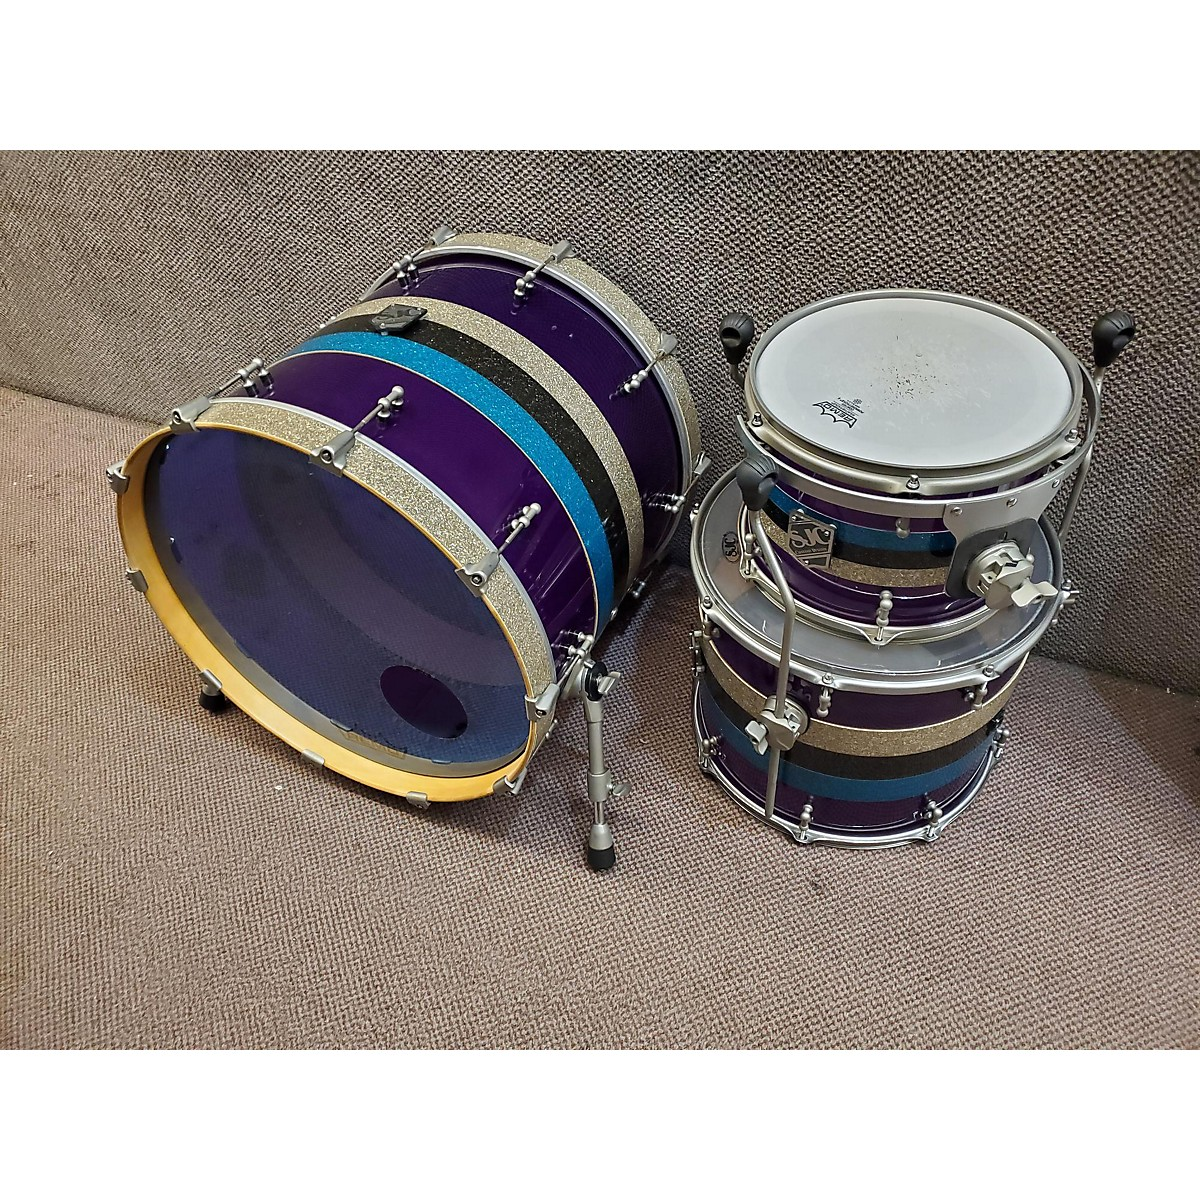 SJC Drums Custom Hybrid Drum Kit